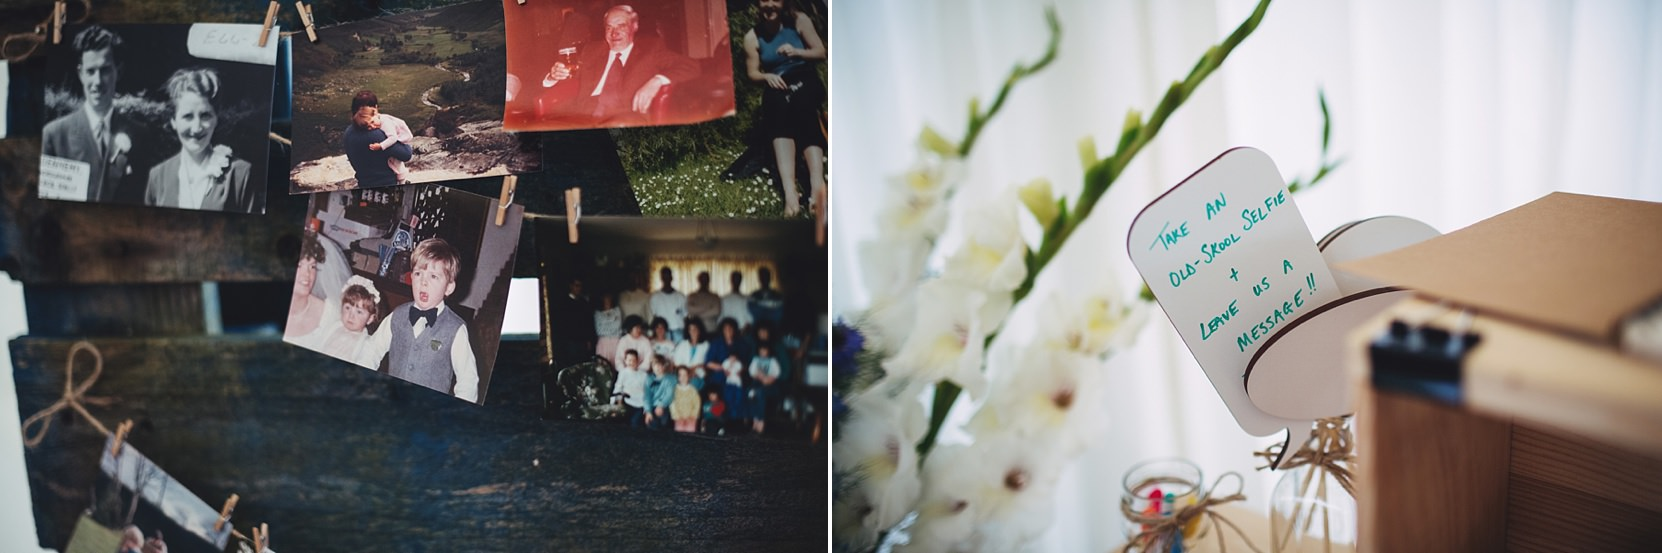 DIY-Wedding-_0008